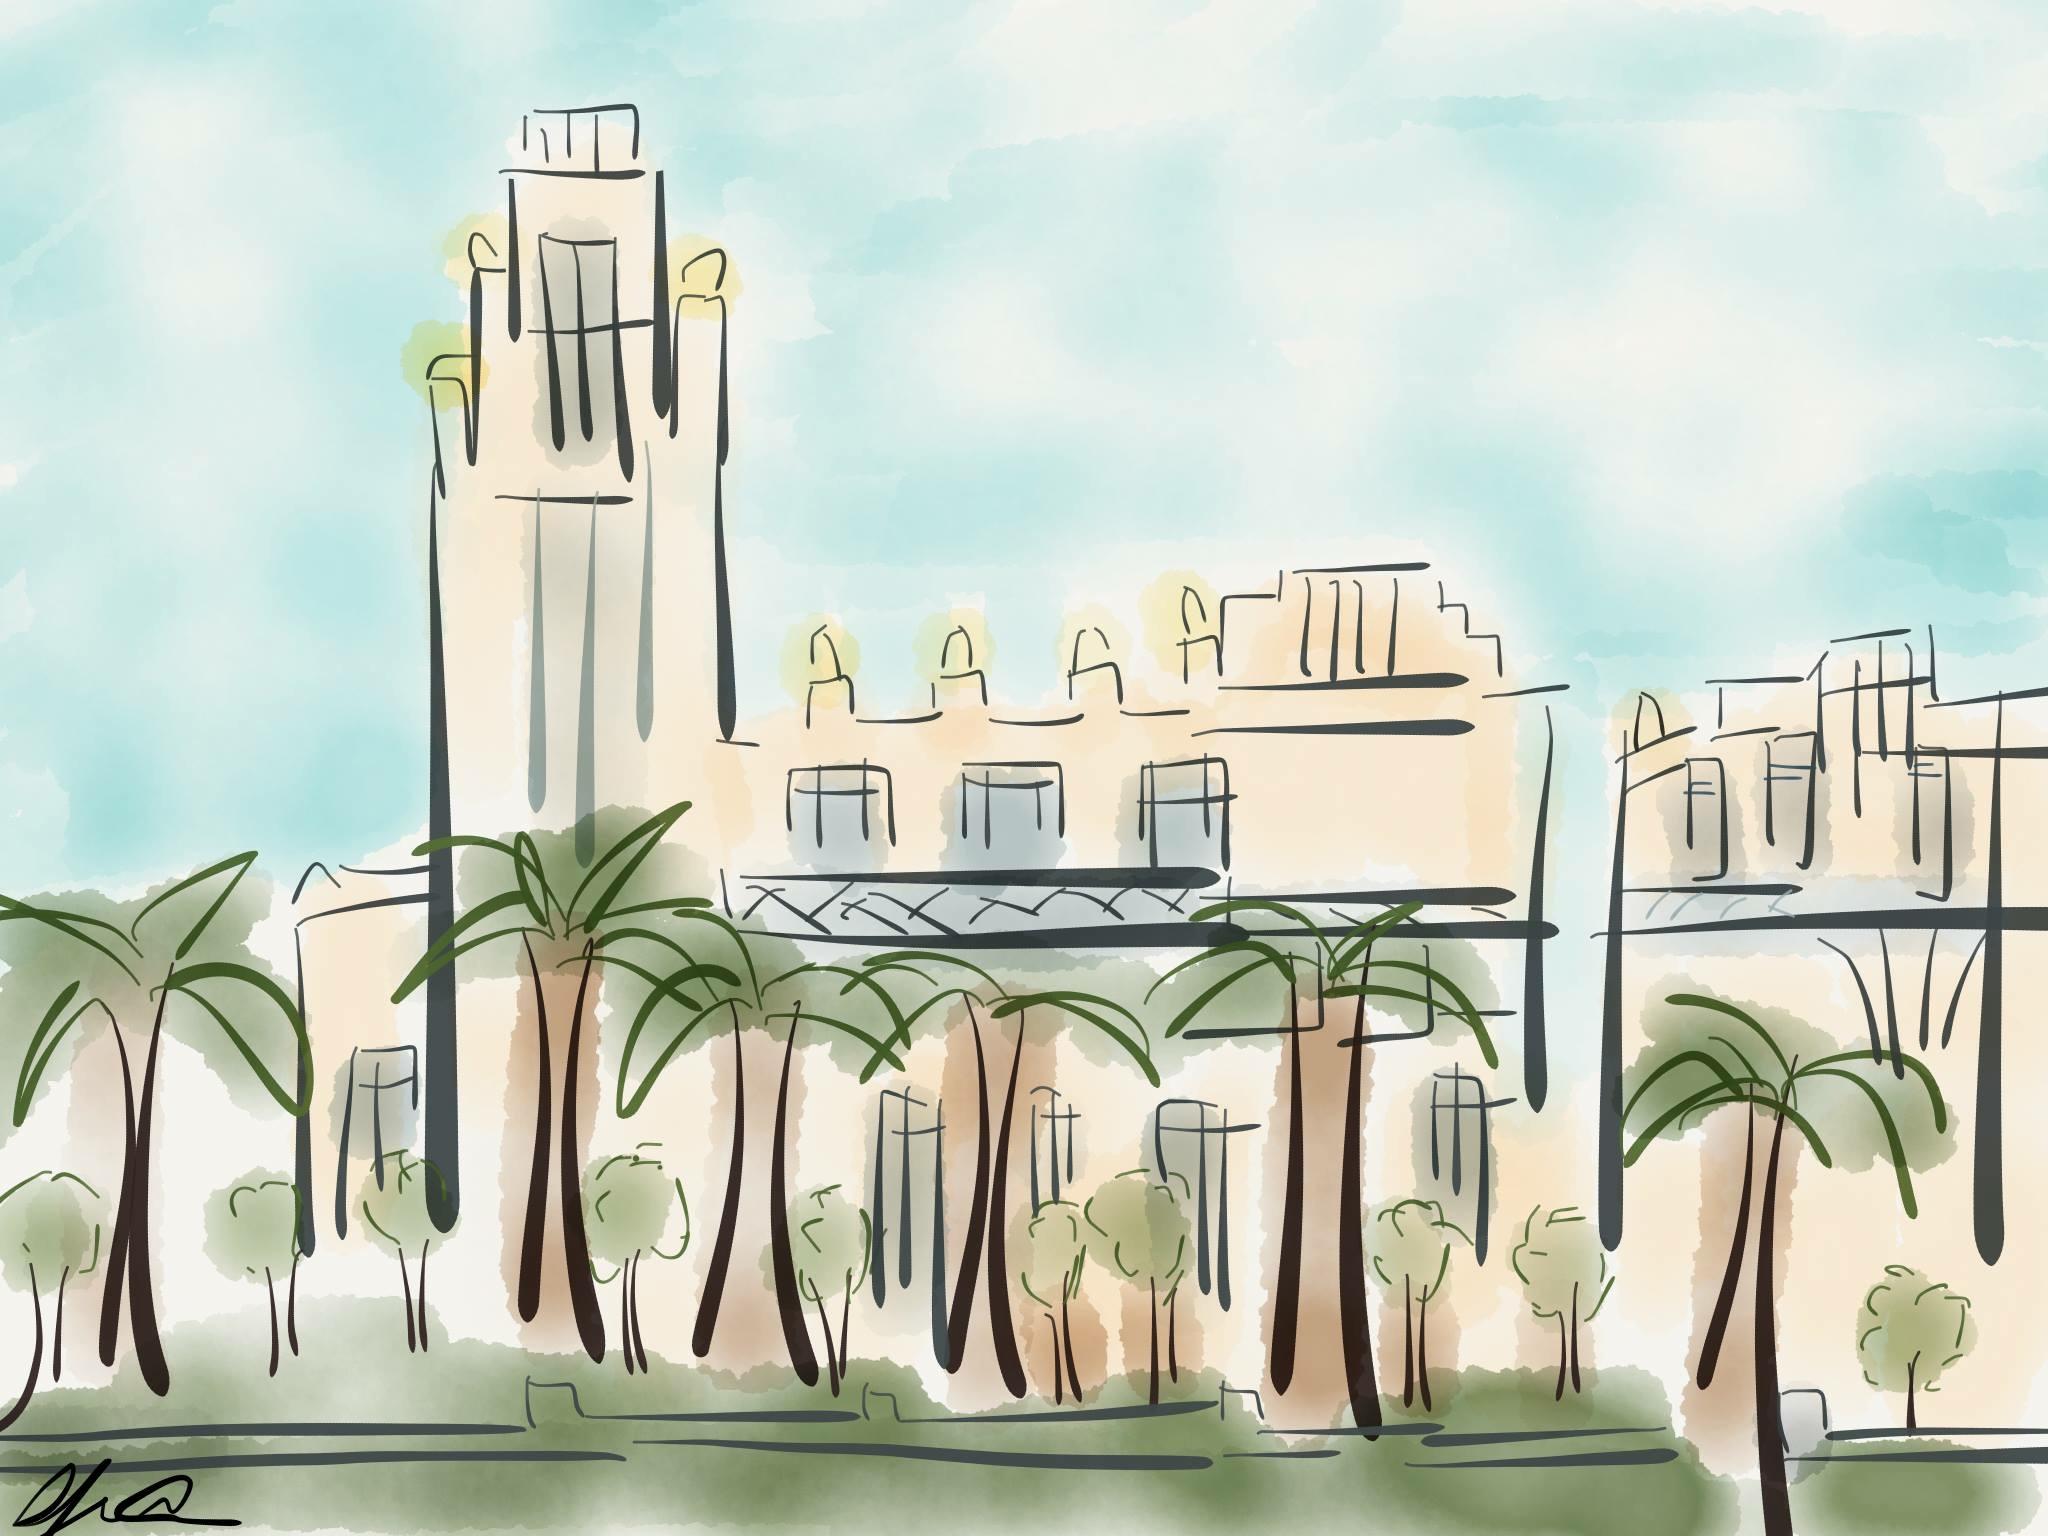 Carrilon Tower